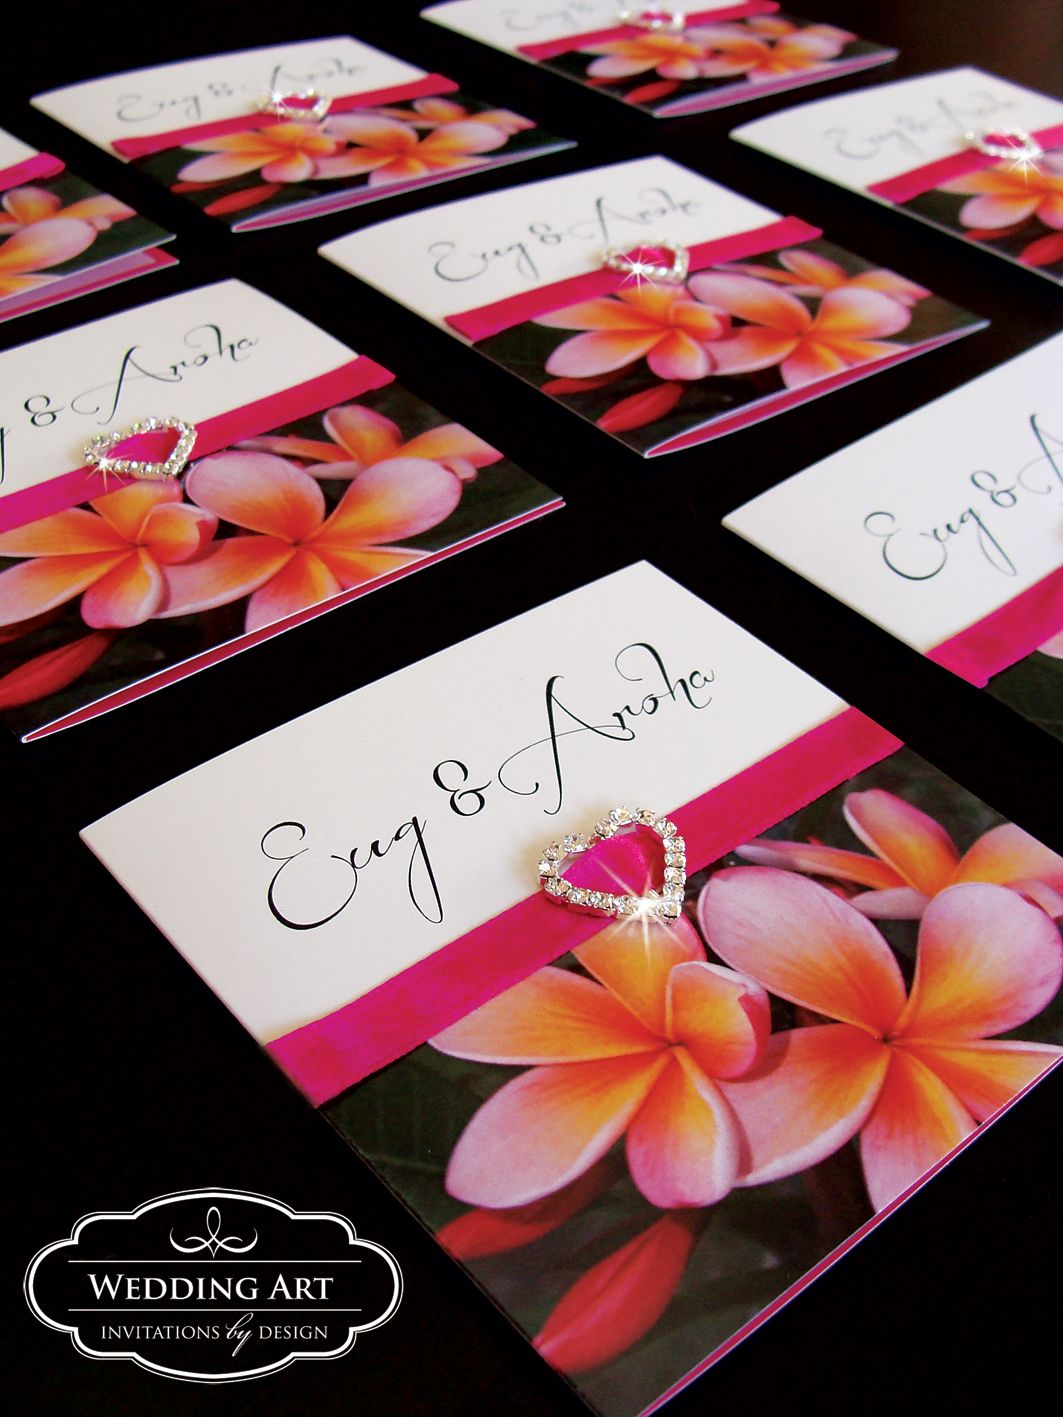 Pink Frangipani Wedding invitation with satin ribbon a heart ...